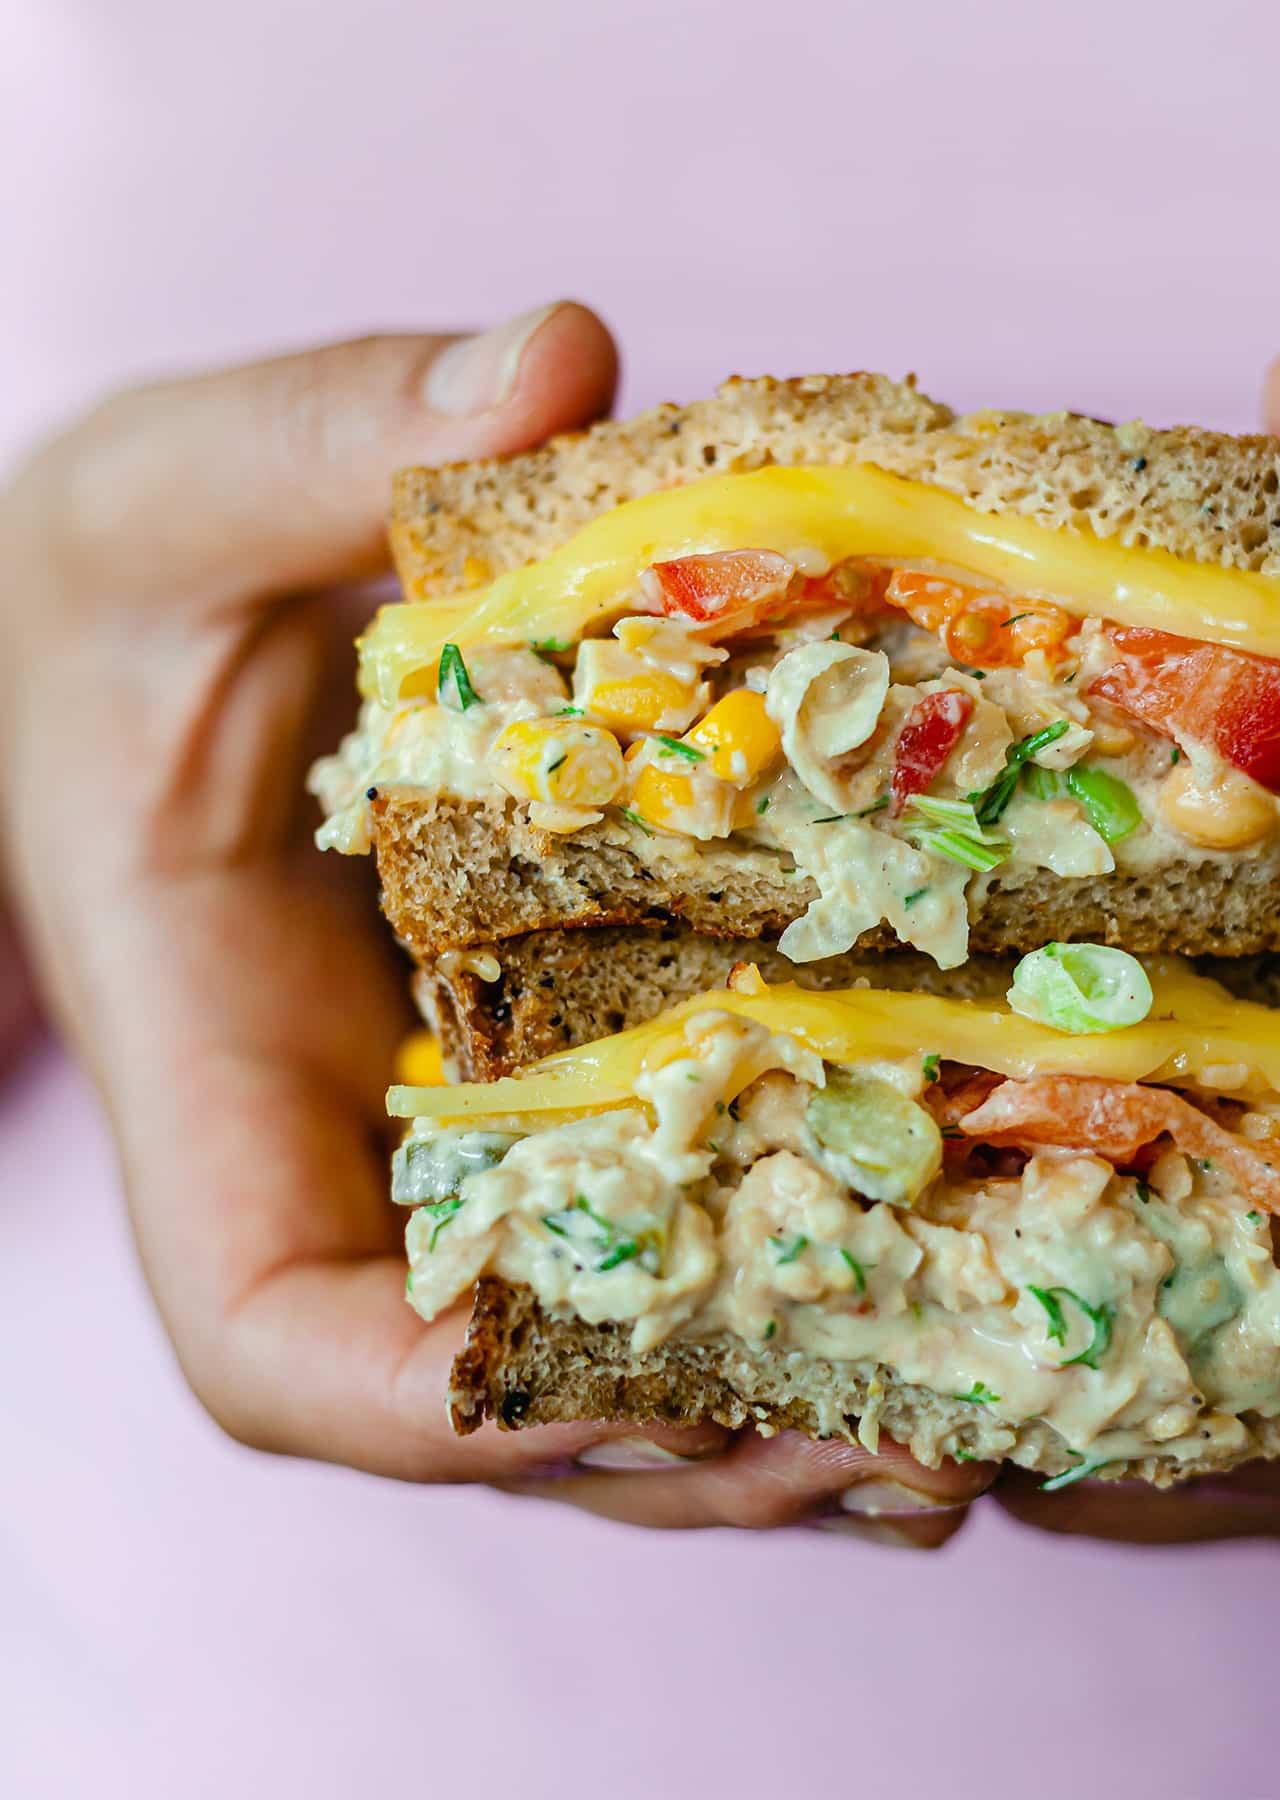 Vegan Chickpea Tuna Melt Sandwich Recipe